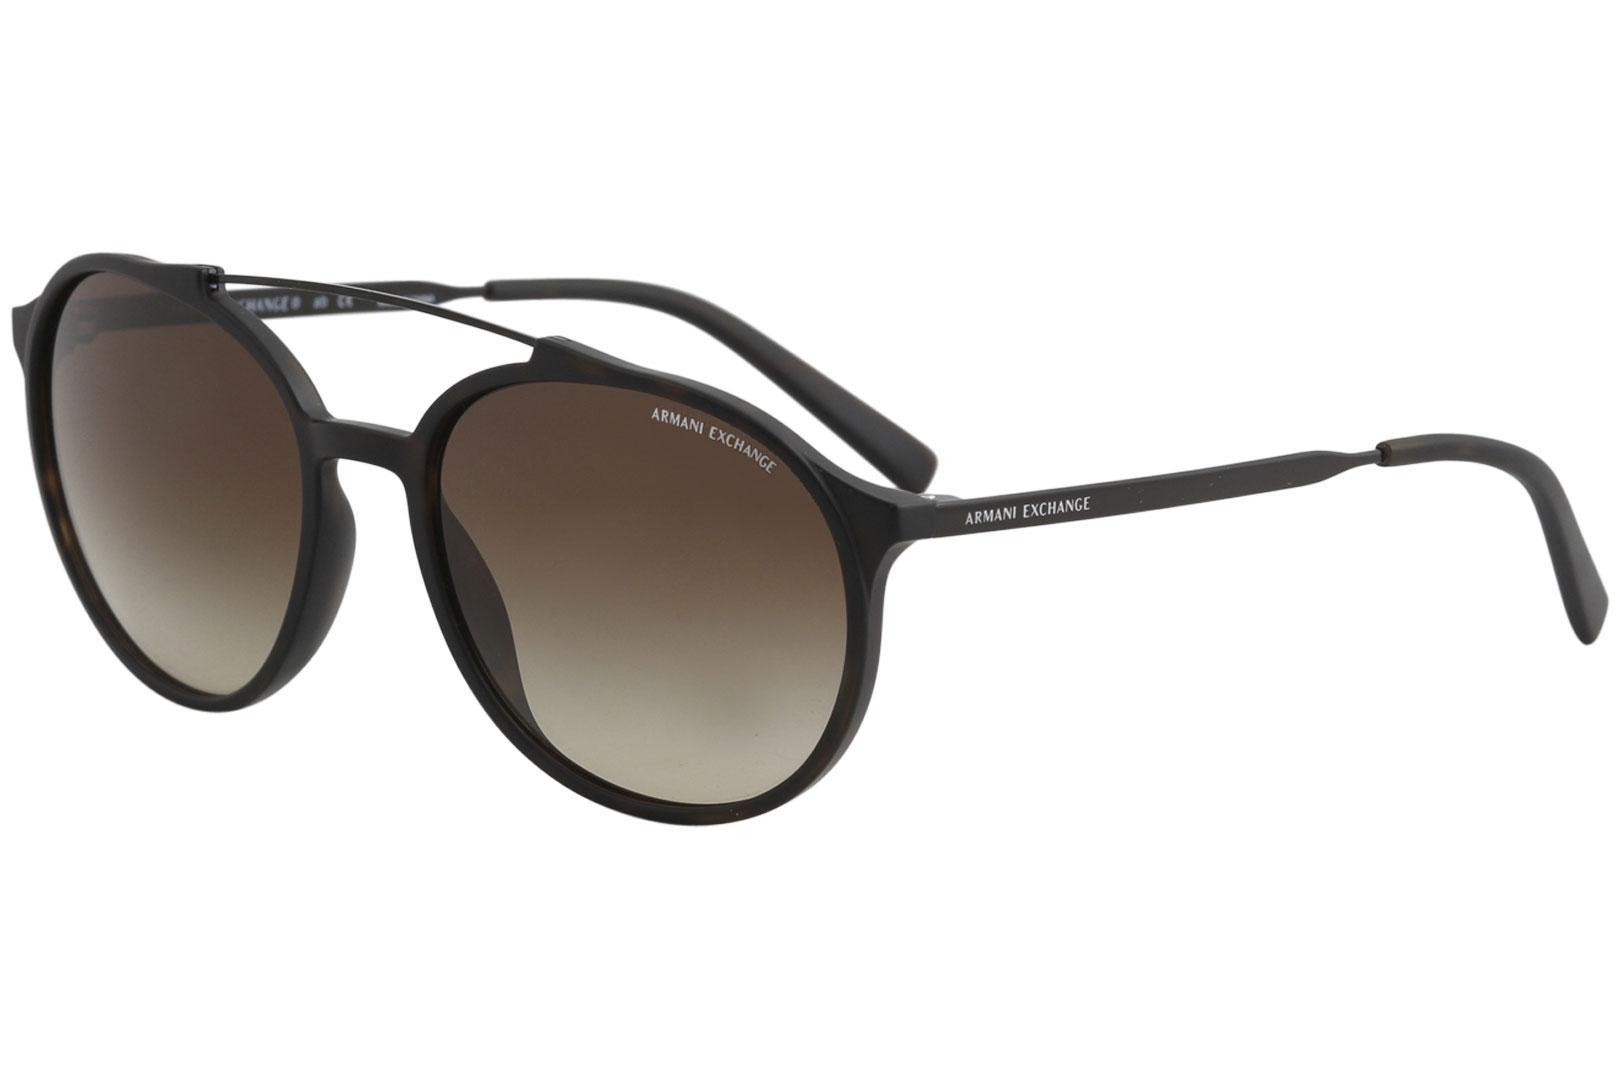 258e4a2ab Armani Exchange Men's AX4069S AX/4069/S Fashion Pilot Sunglasses